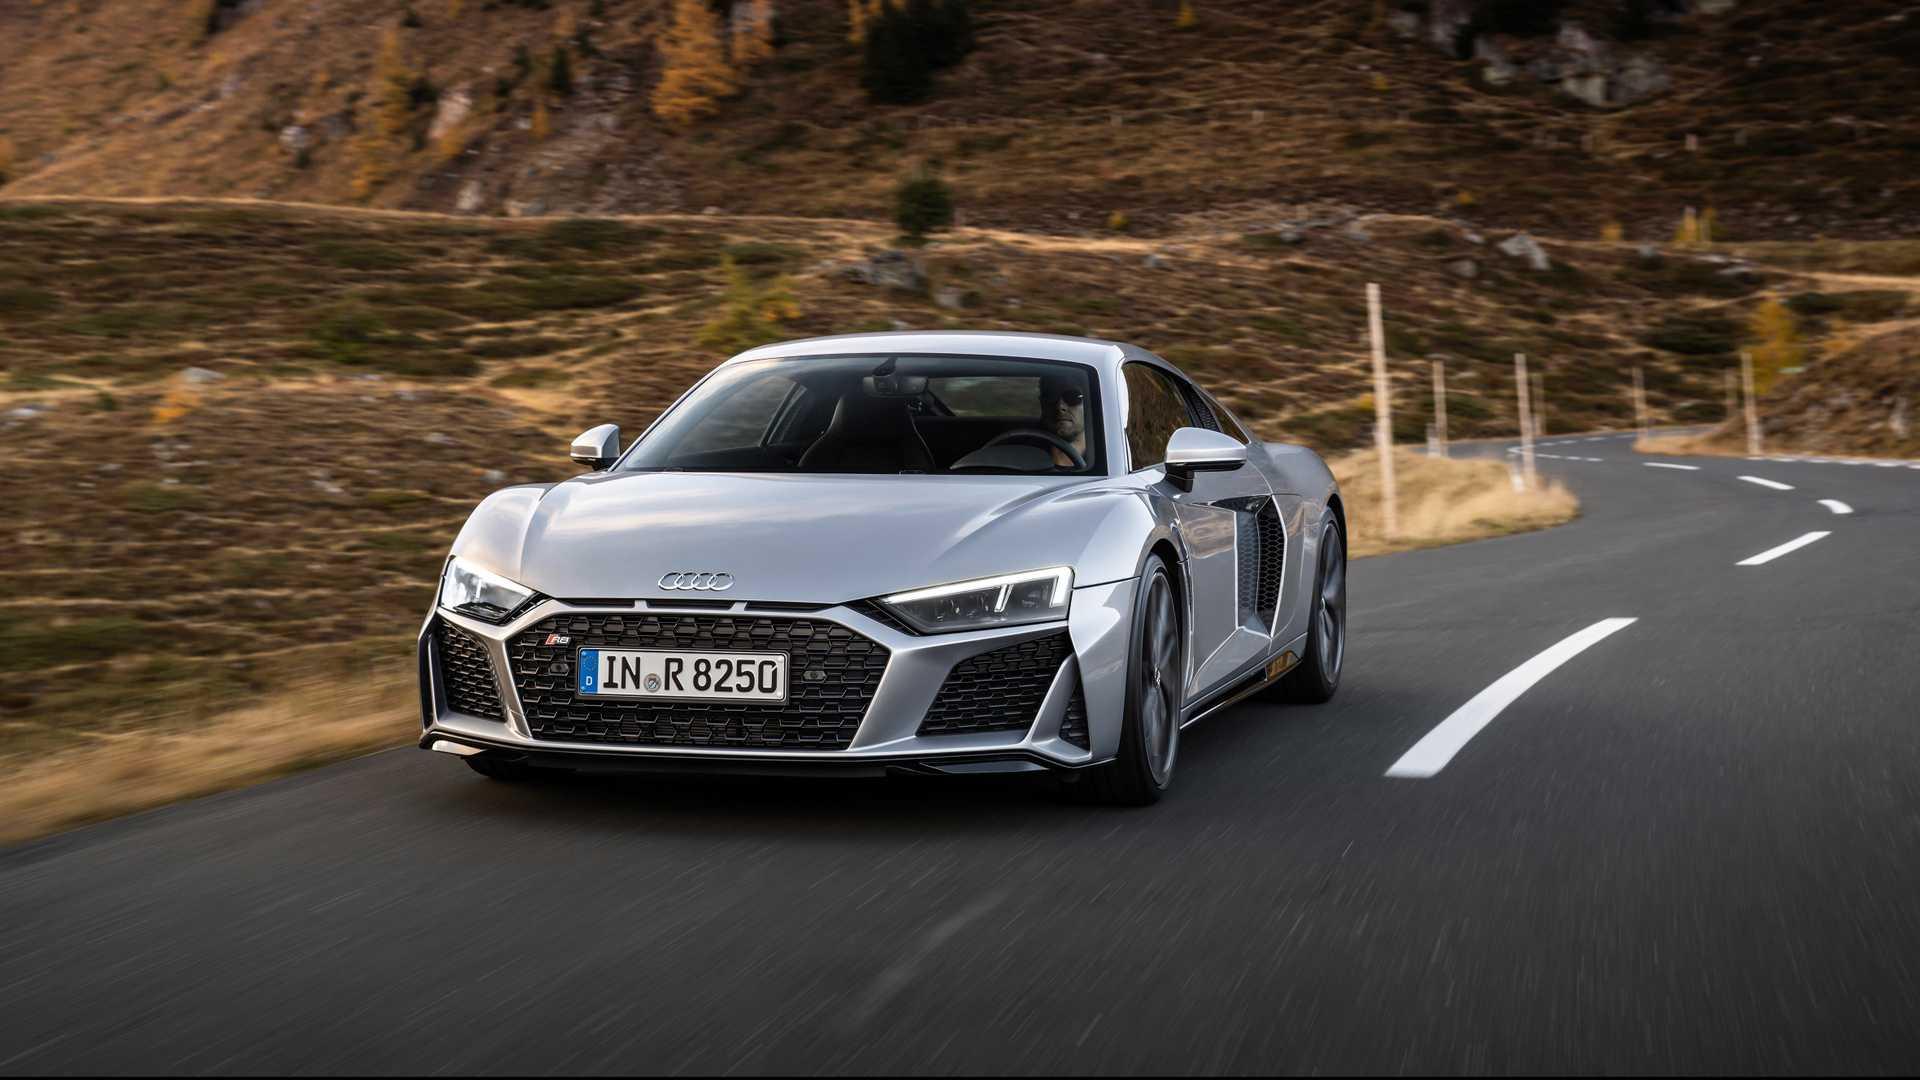 latest model Audi R8 V10 RWD Spyder